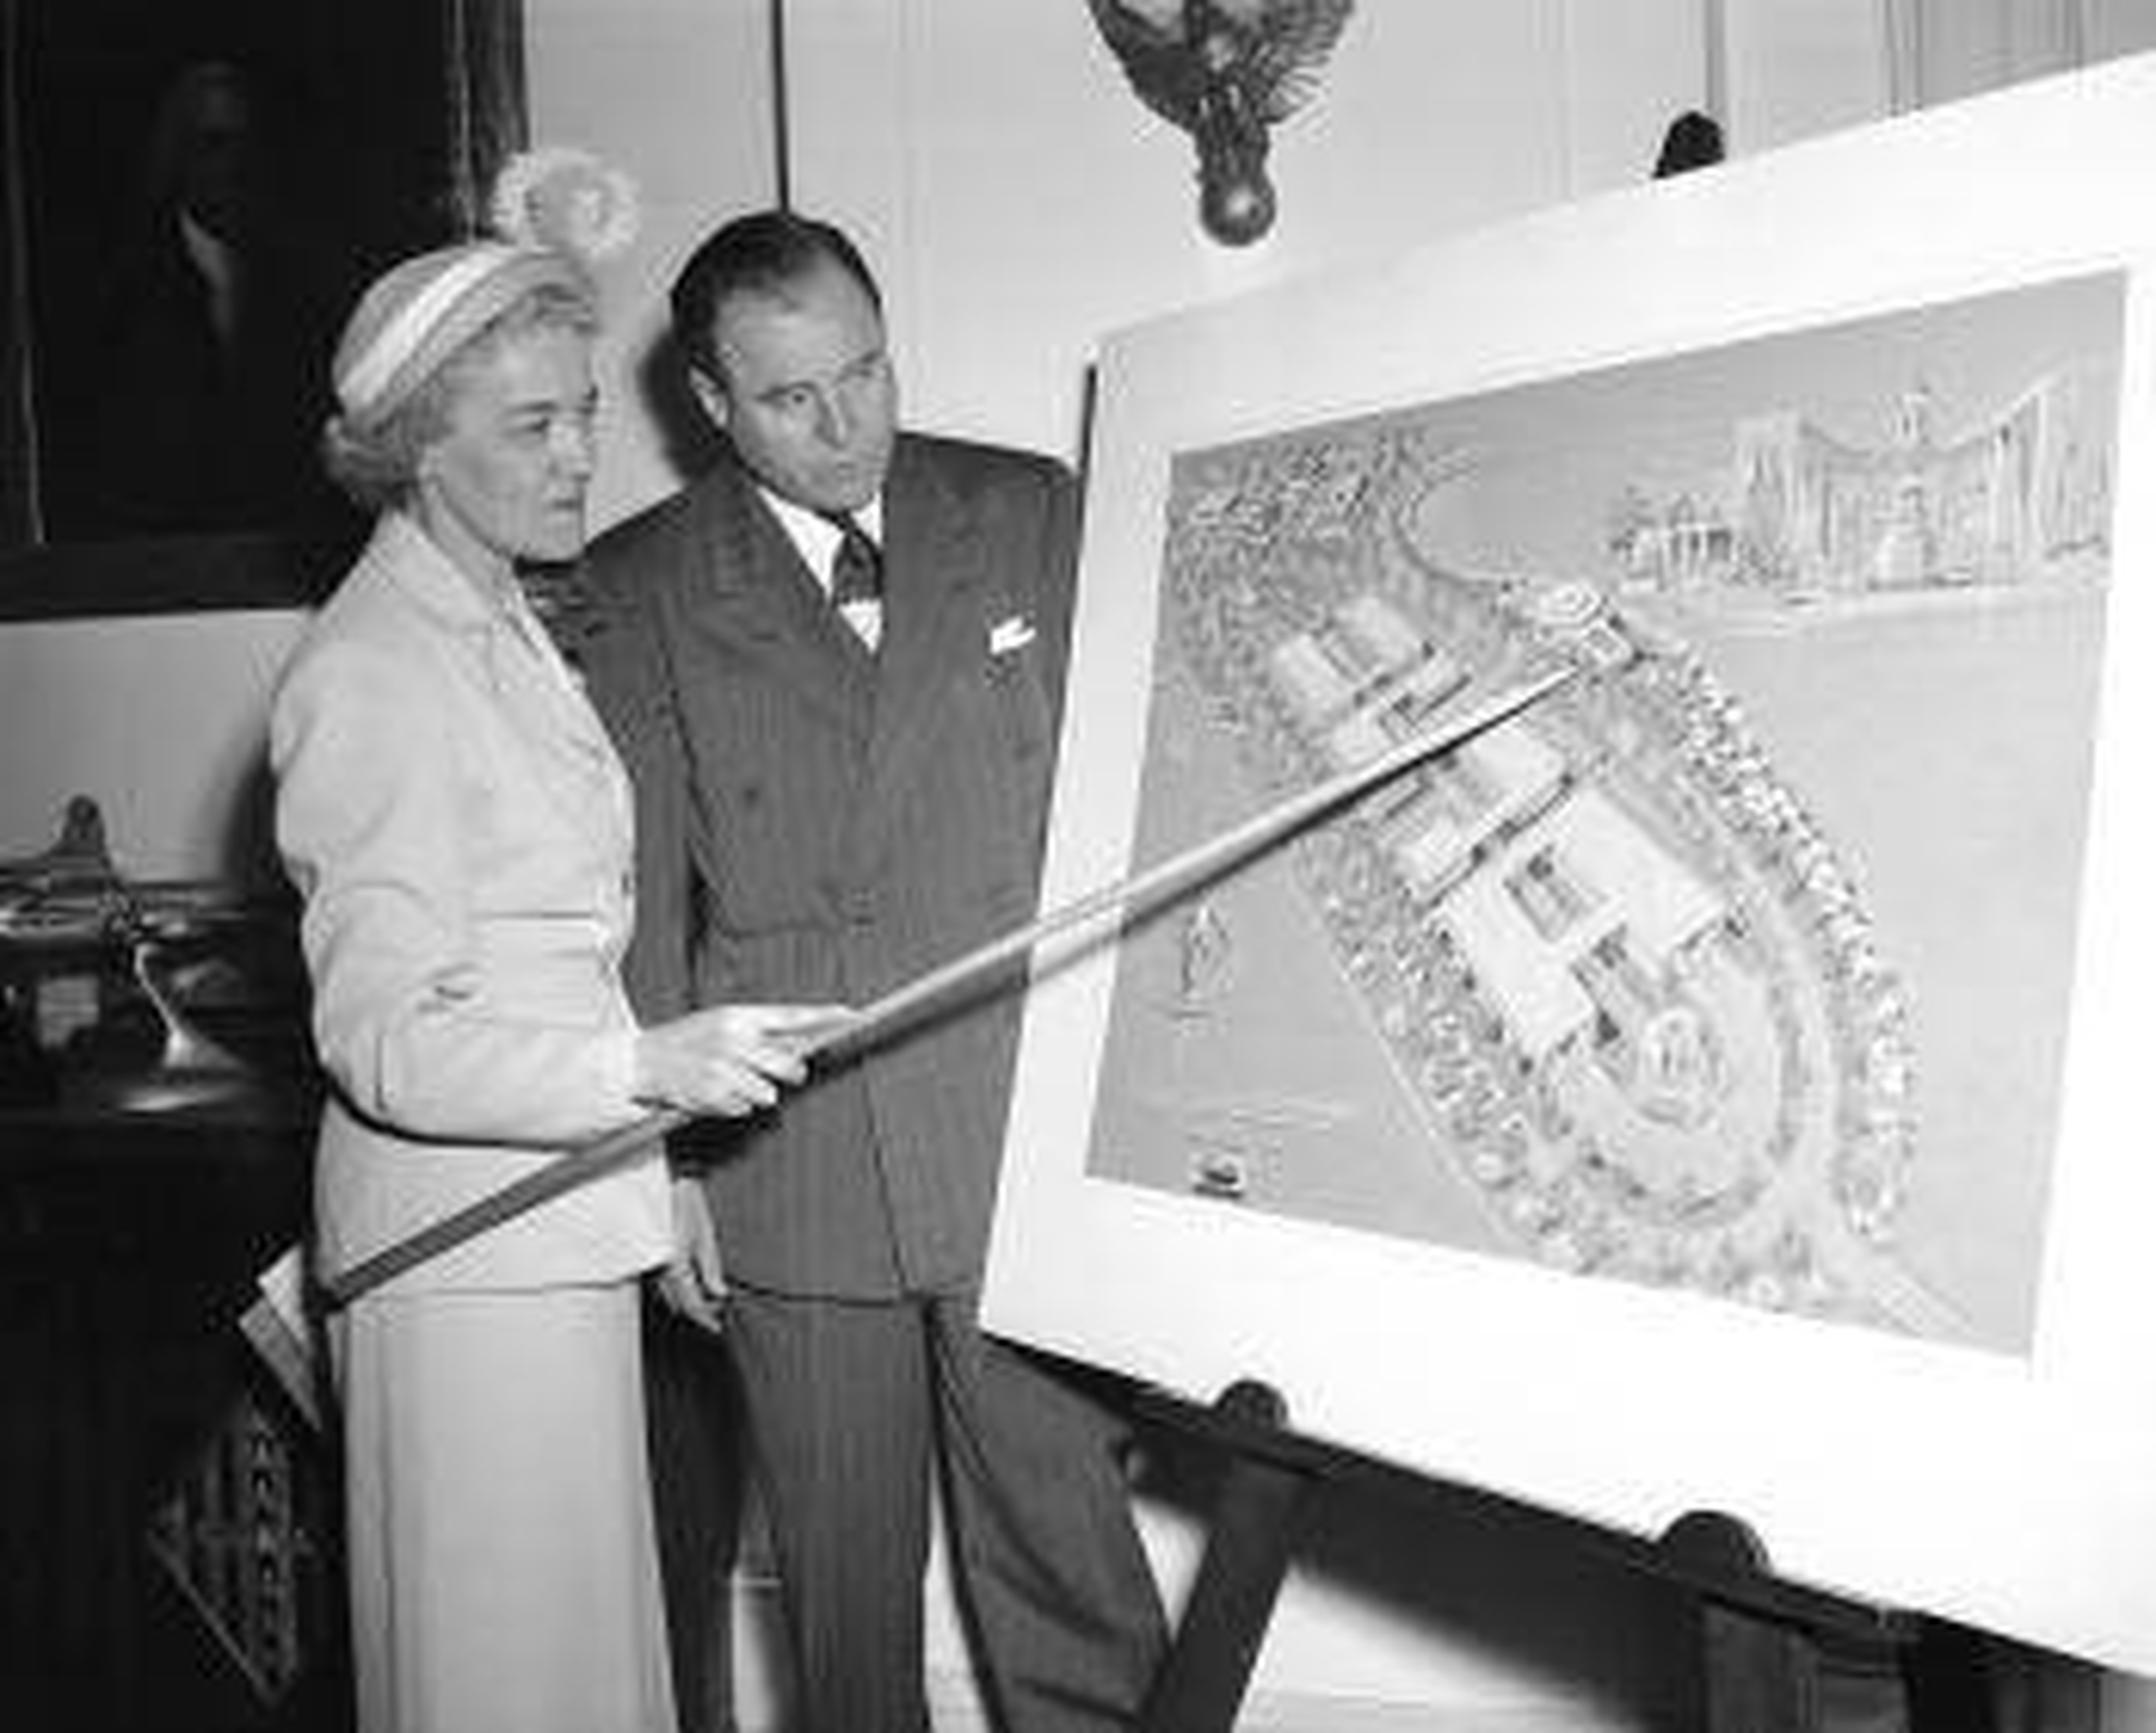 Senators Margaret Chase Smith and Edward McGrath in 1949.